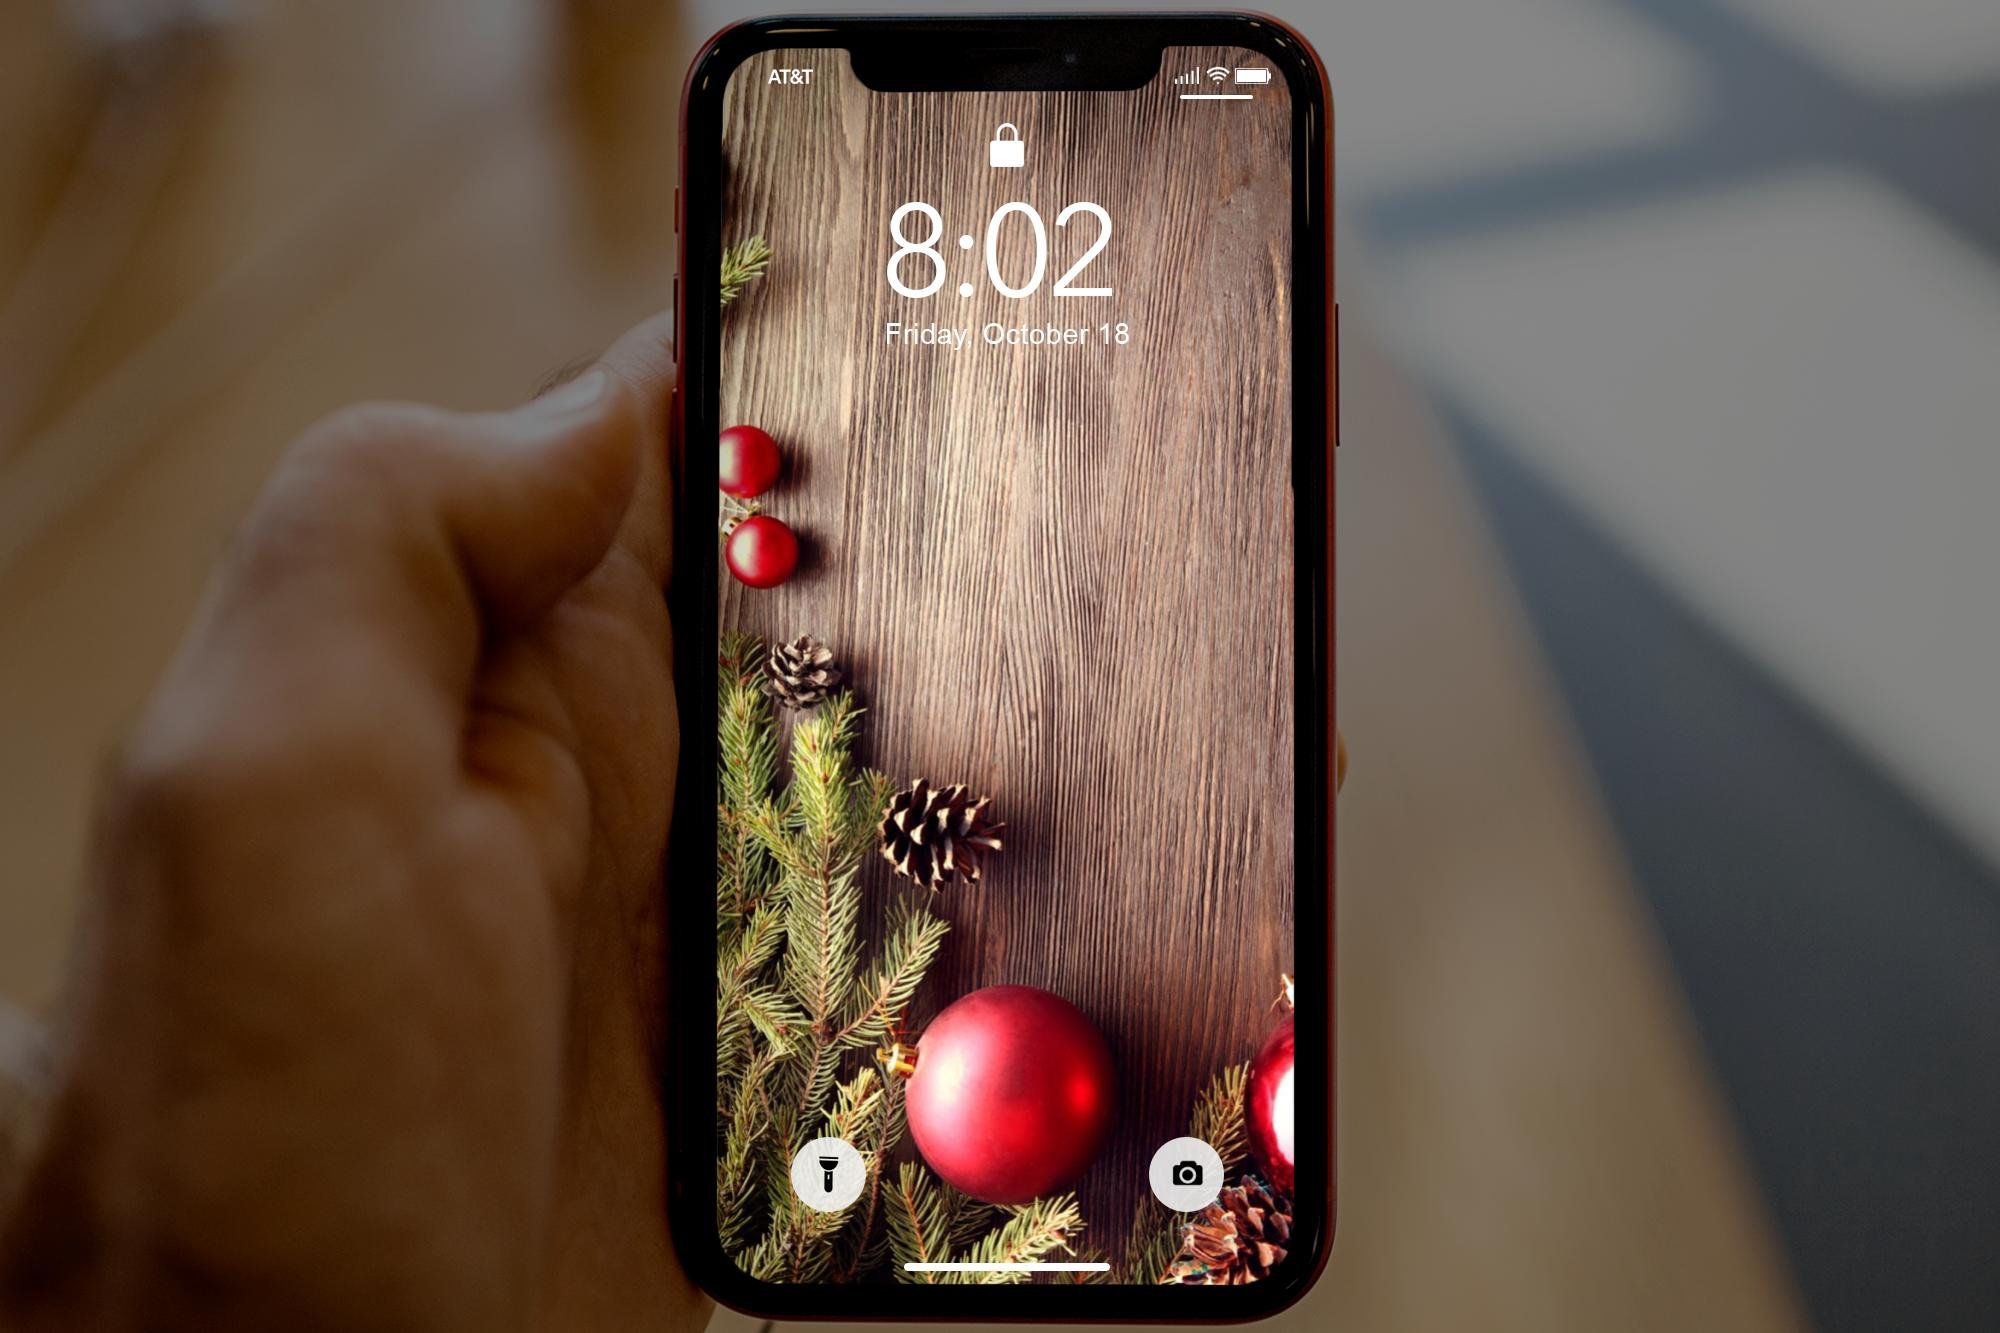 Christmas Wreath With Ornaments On Dark Wood, Christmas iPhone wallpaper, Christmas Cell phone background, Christmas iPhone lock screen #darkiphonewallpaper